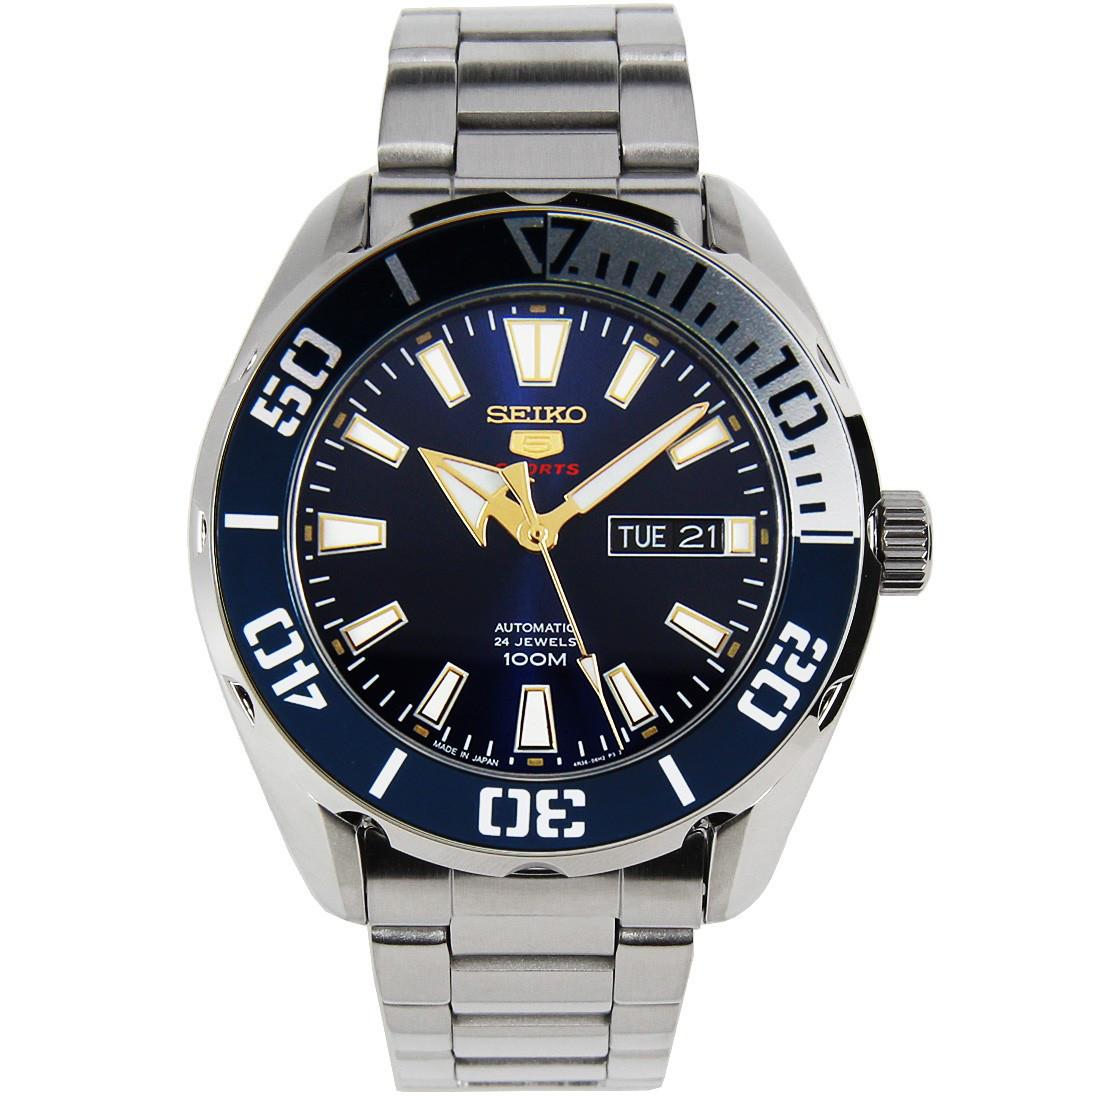 Часы Seiko 5 Sports SRPC51K1 Automatic 4R36